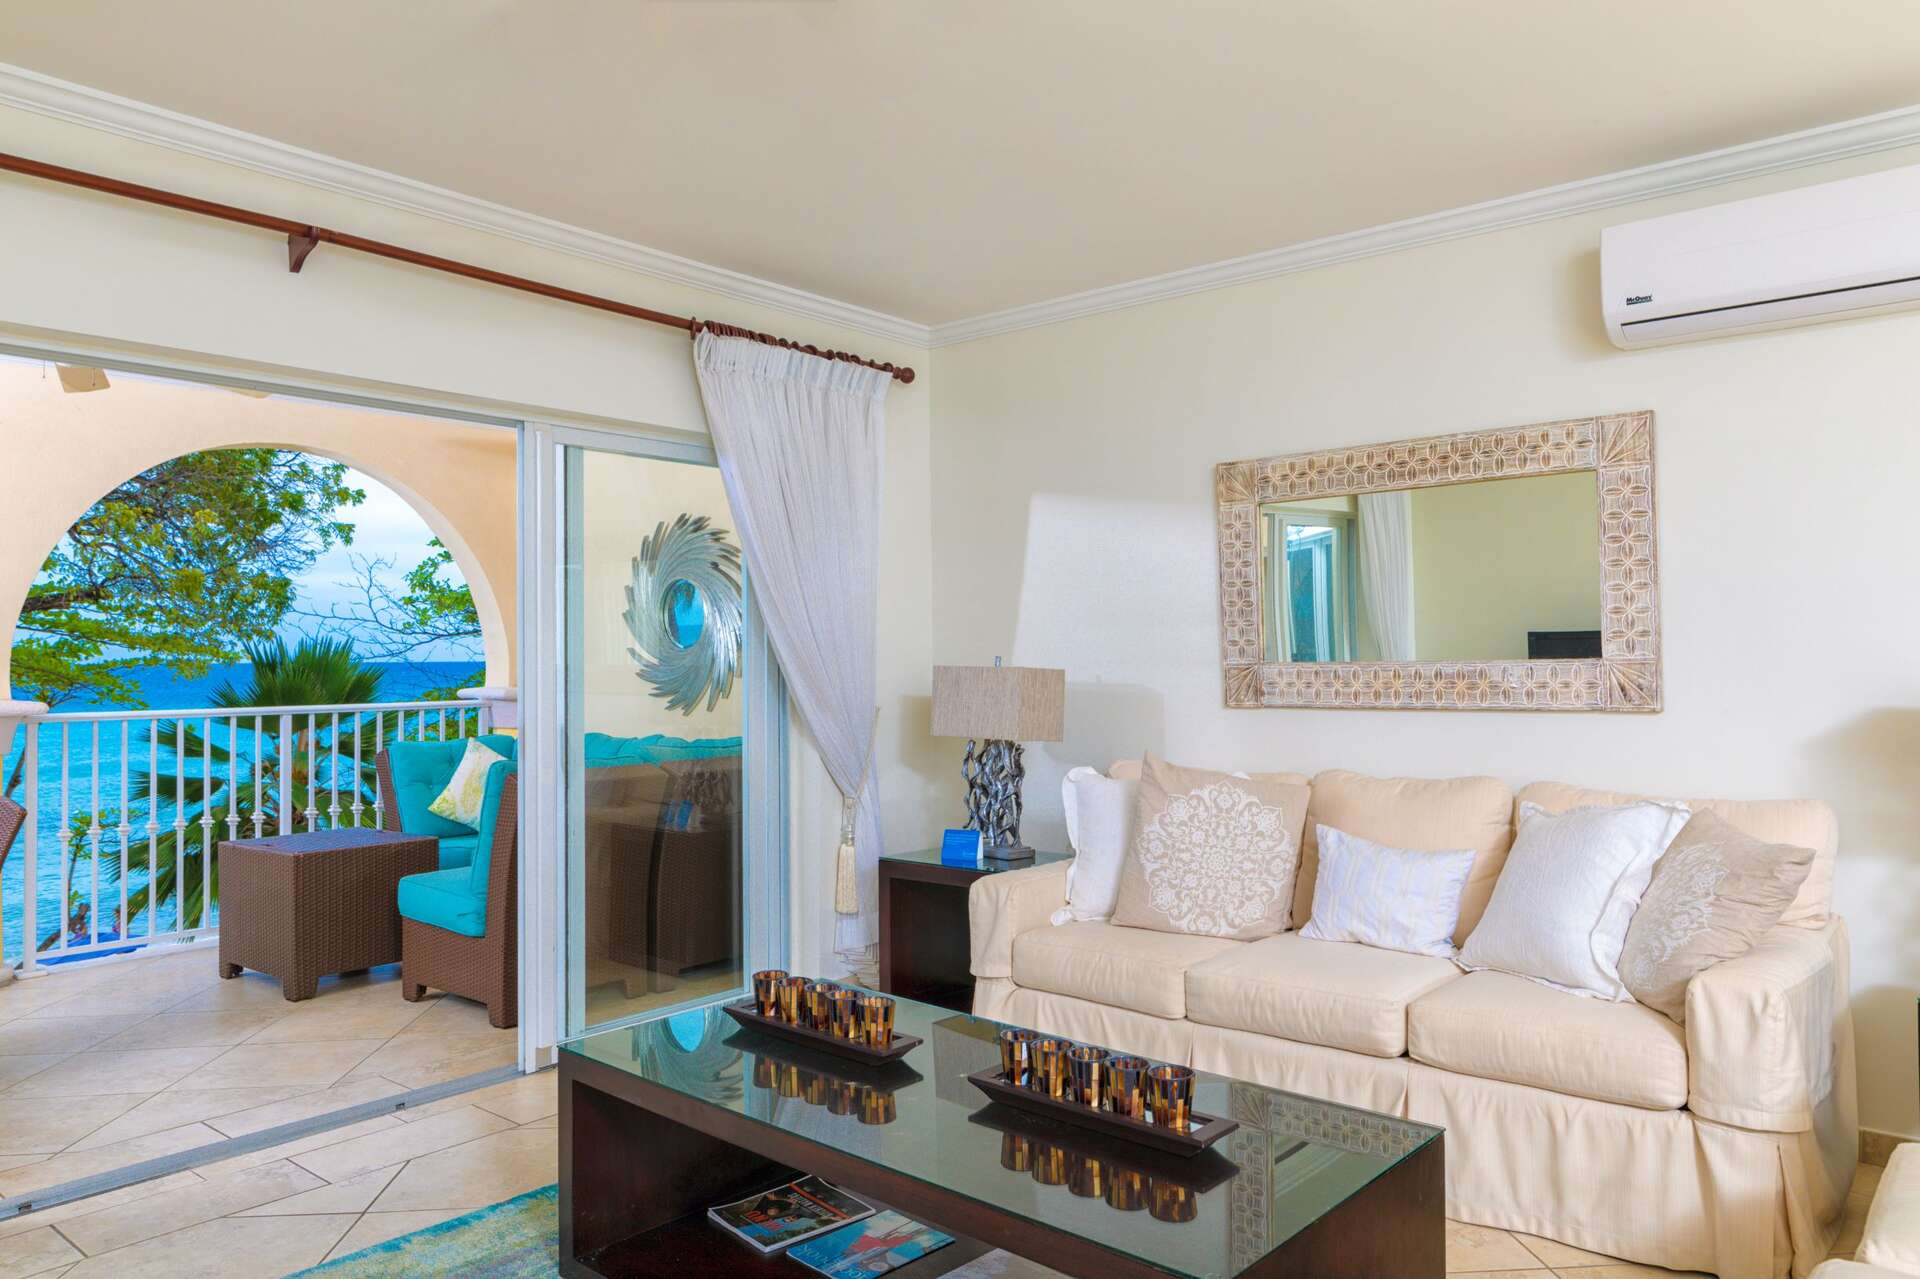 Luxury villa rentals caribbean - Barbados - Christ church - Oistins  - Sapphire Beach 211 - Image 1/14